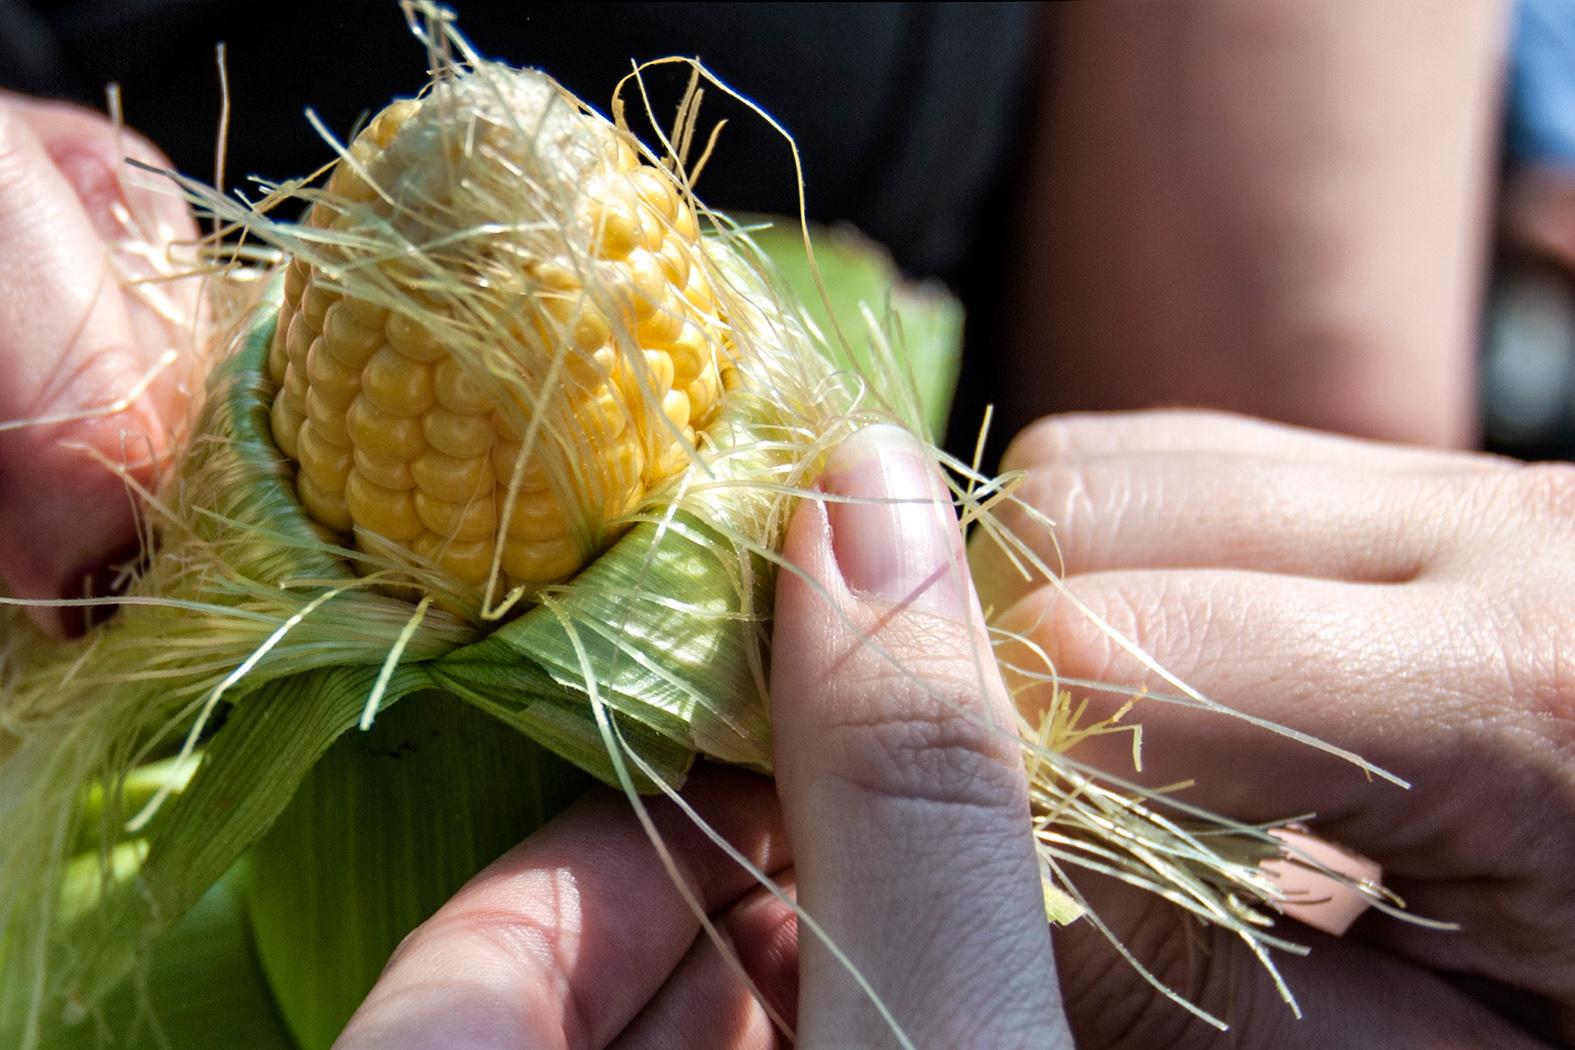 Peeling back the husk of an ear of corn at a farmer's market.